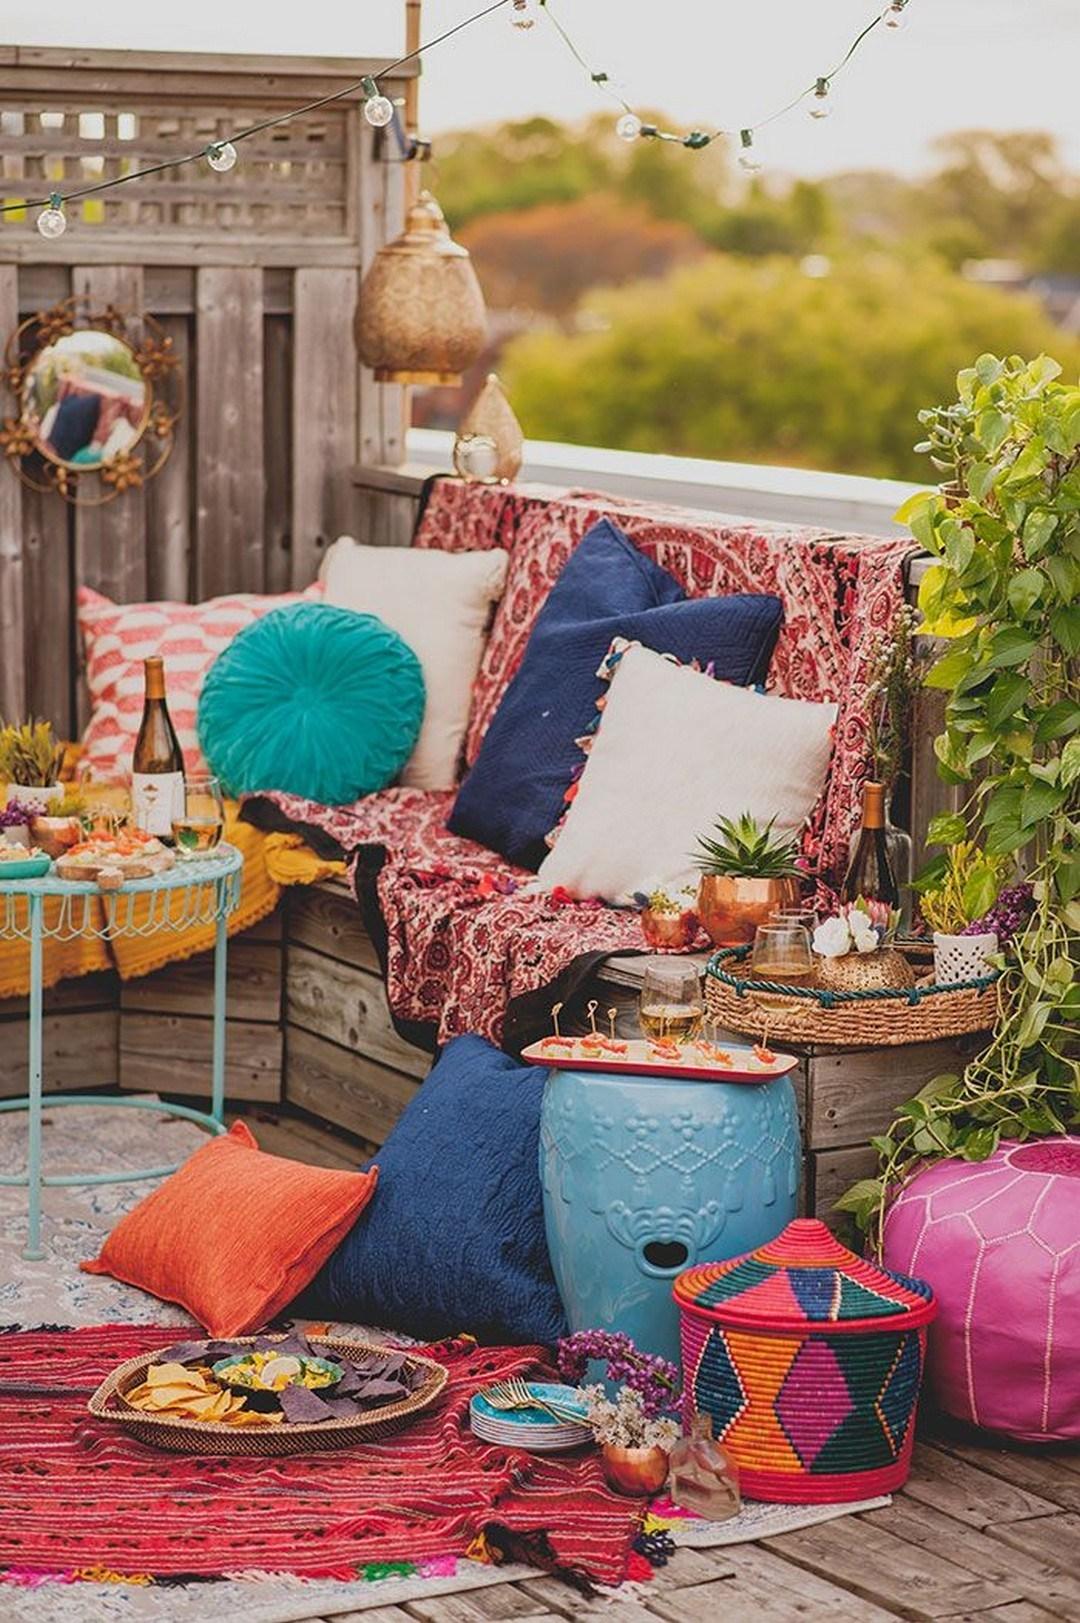 75 Charming Morocco-Style Patio Designs - DigsDigs on Moroccan Backyard Design  id=49342